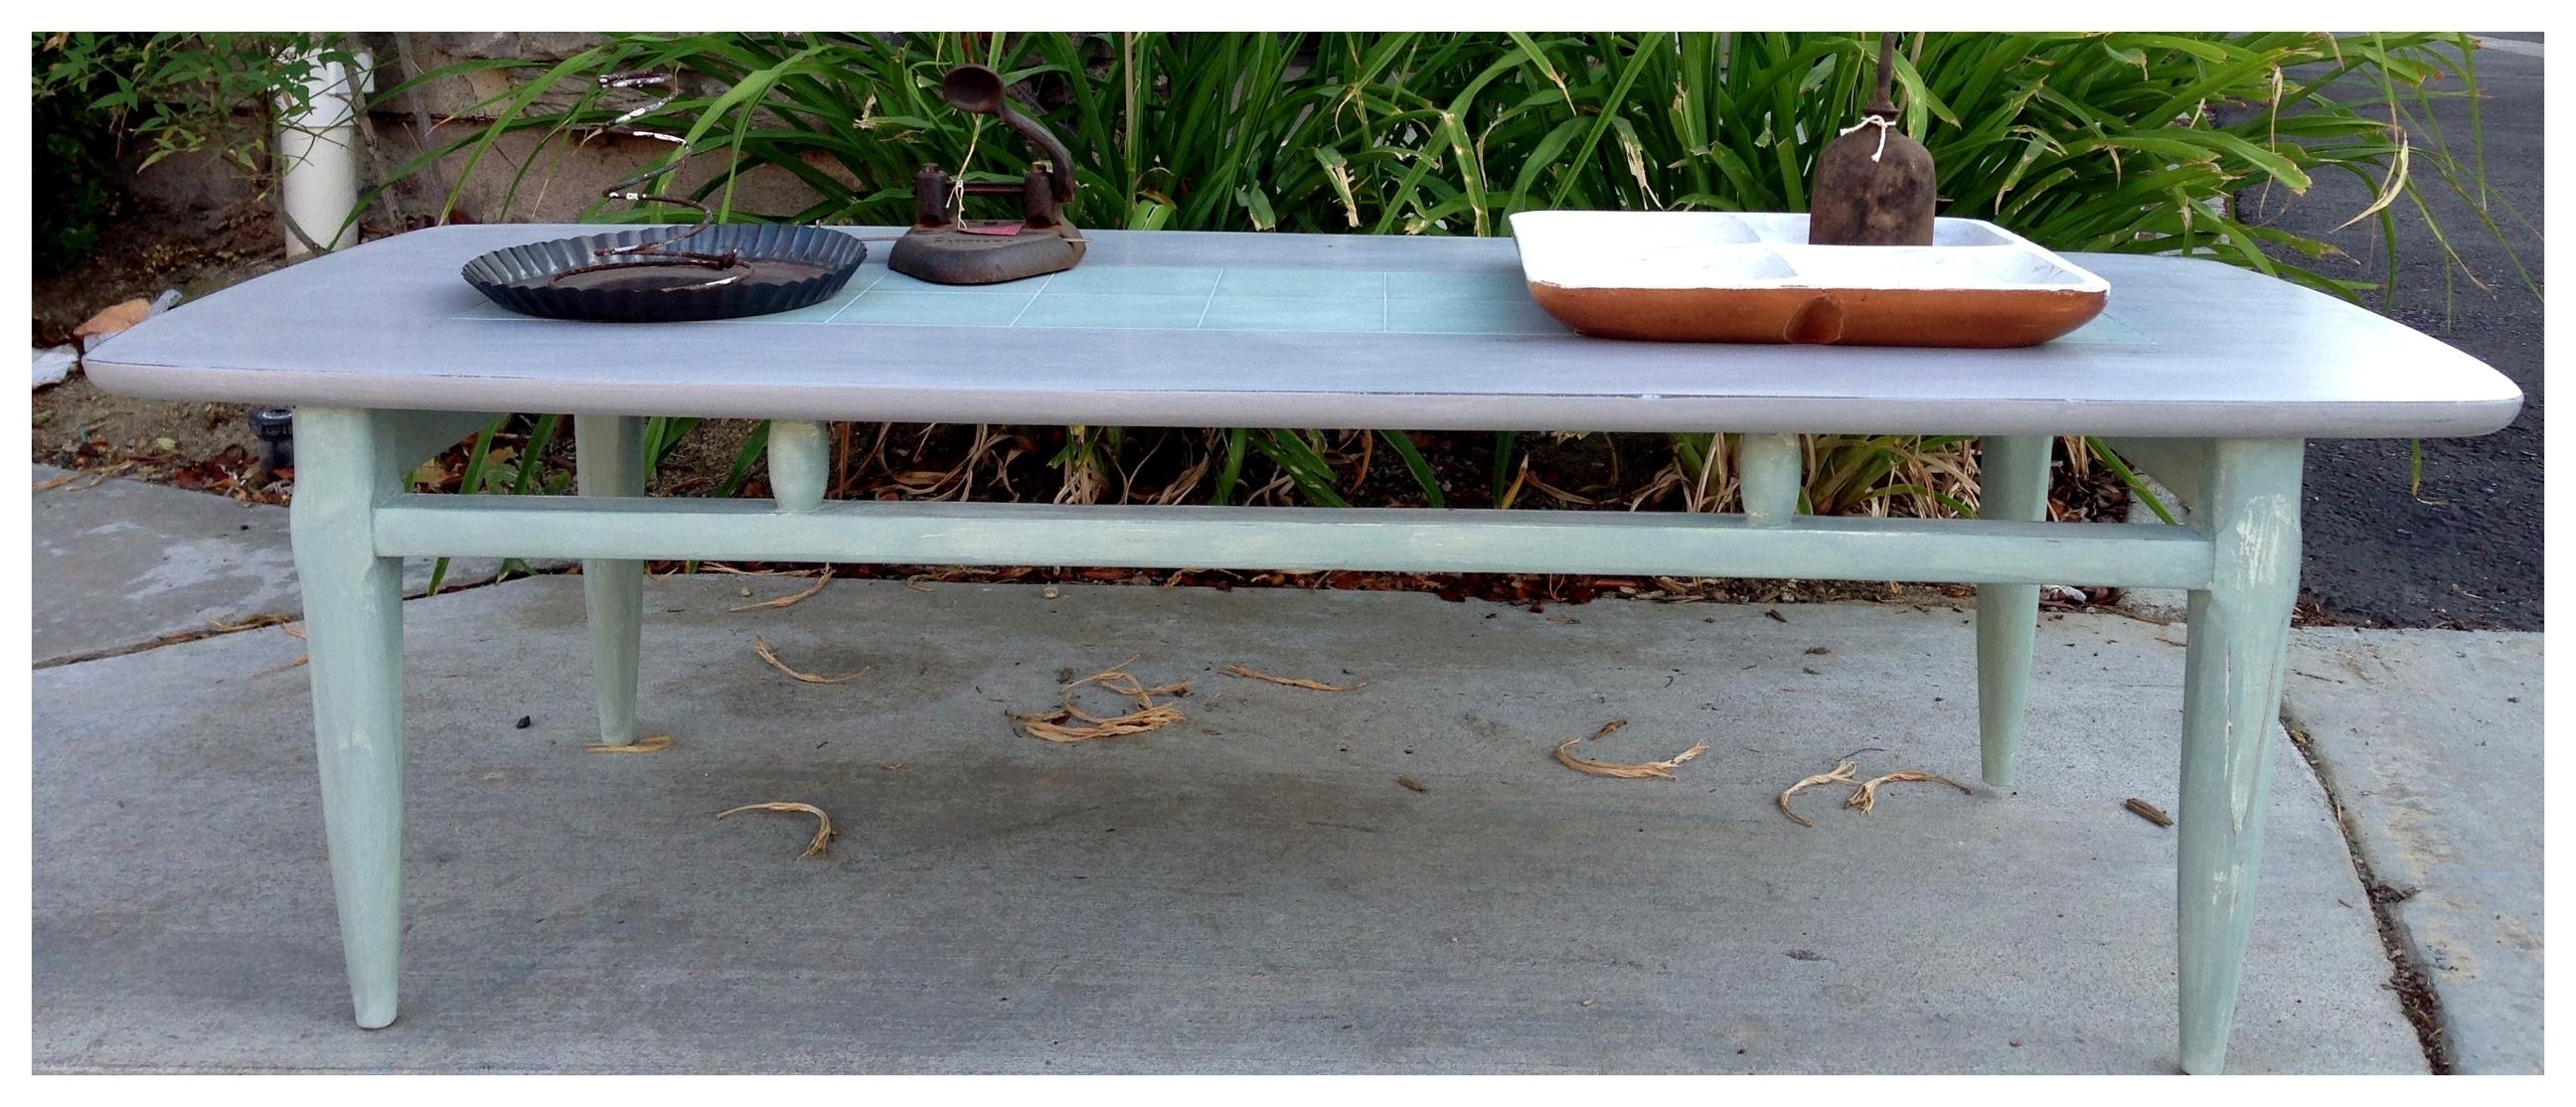 Mid Century Modern Coffee Table | The Calitexan pertaining to Mid-Century Modern Egg Tables (Image 7 of 30)